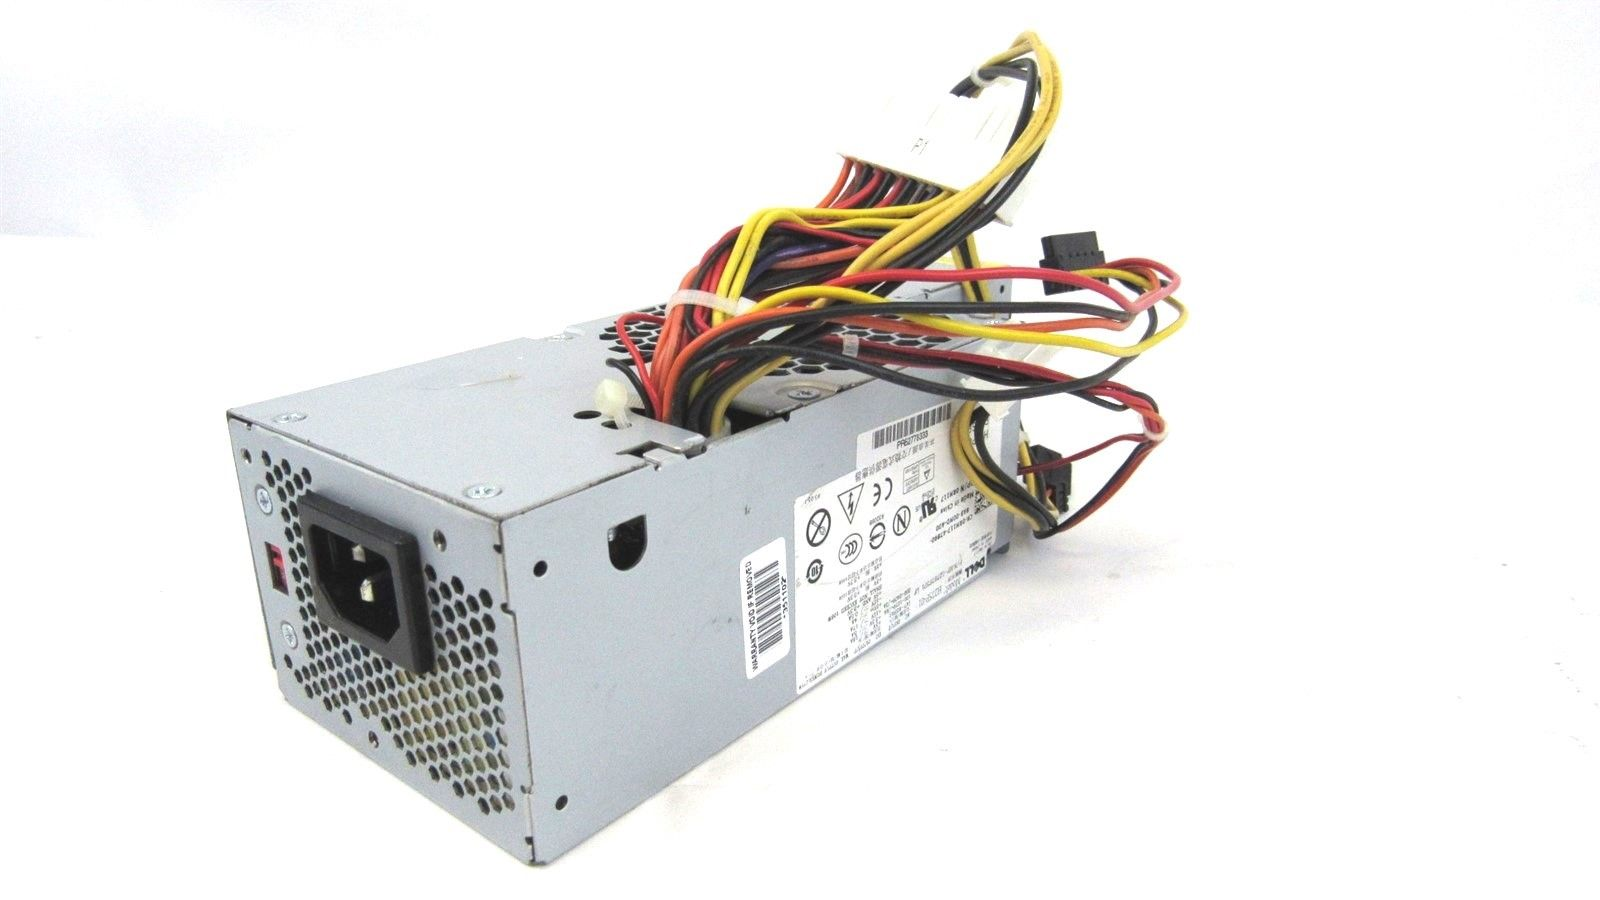 Dell Genuine Optiplex 745 755 740 Power Supply 275W H275P-01 RM117 0RM117